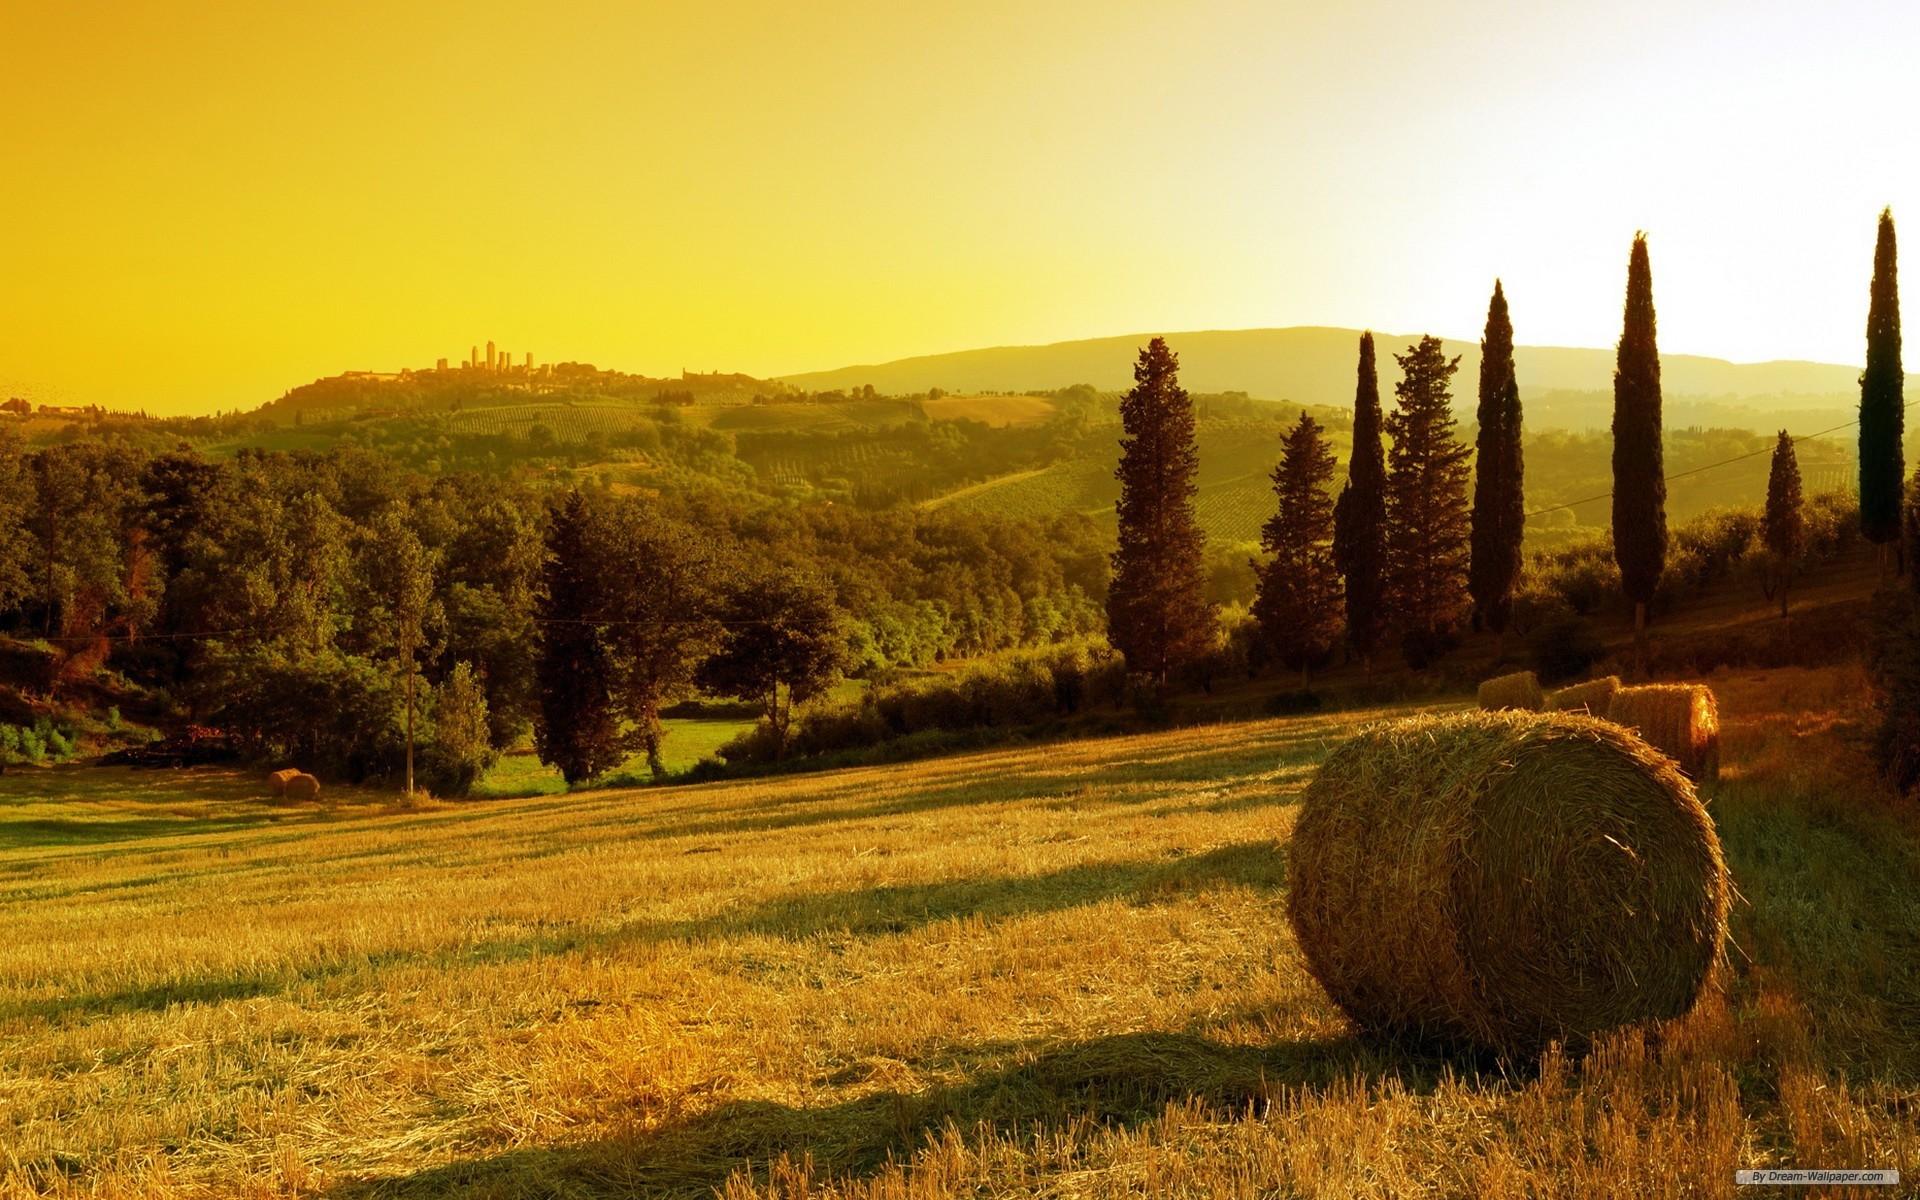 Free Nature wallpaper - Tuscany wallpaper - 1920x1200 wallpaper - Index 16